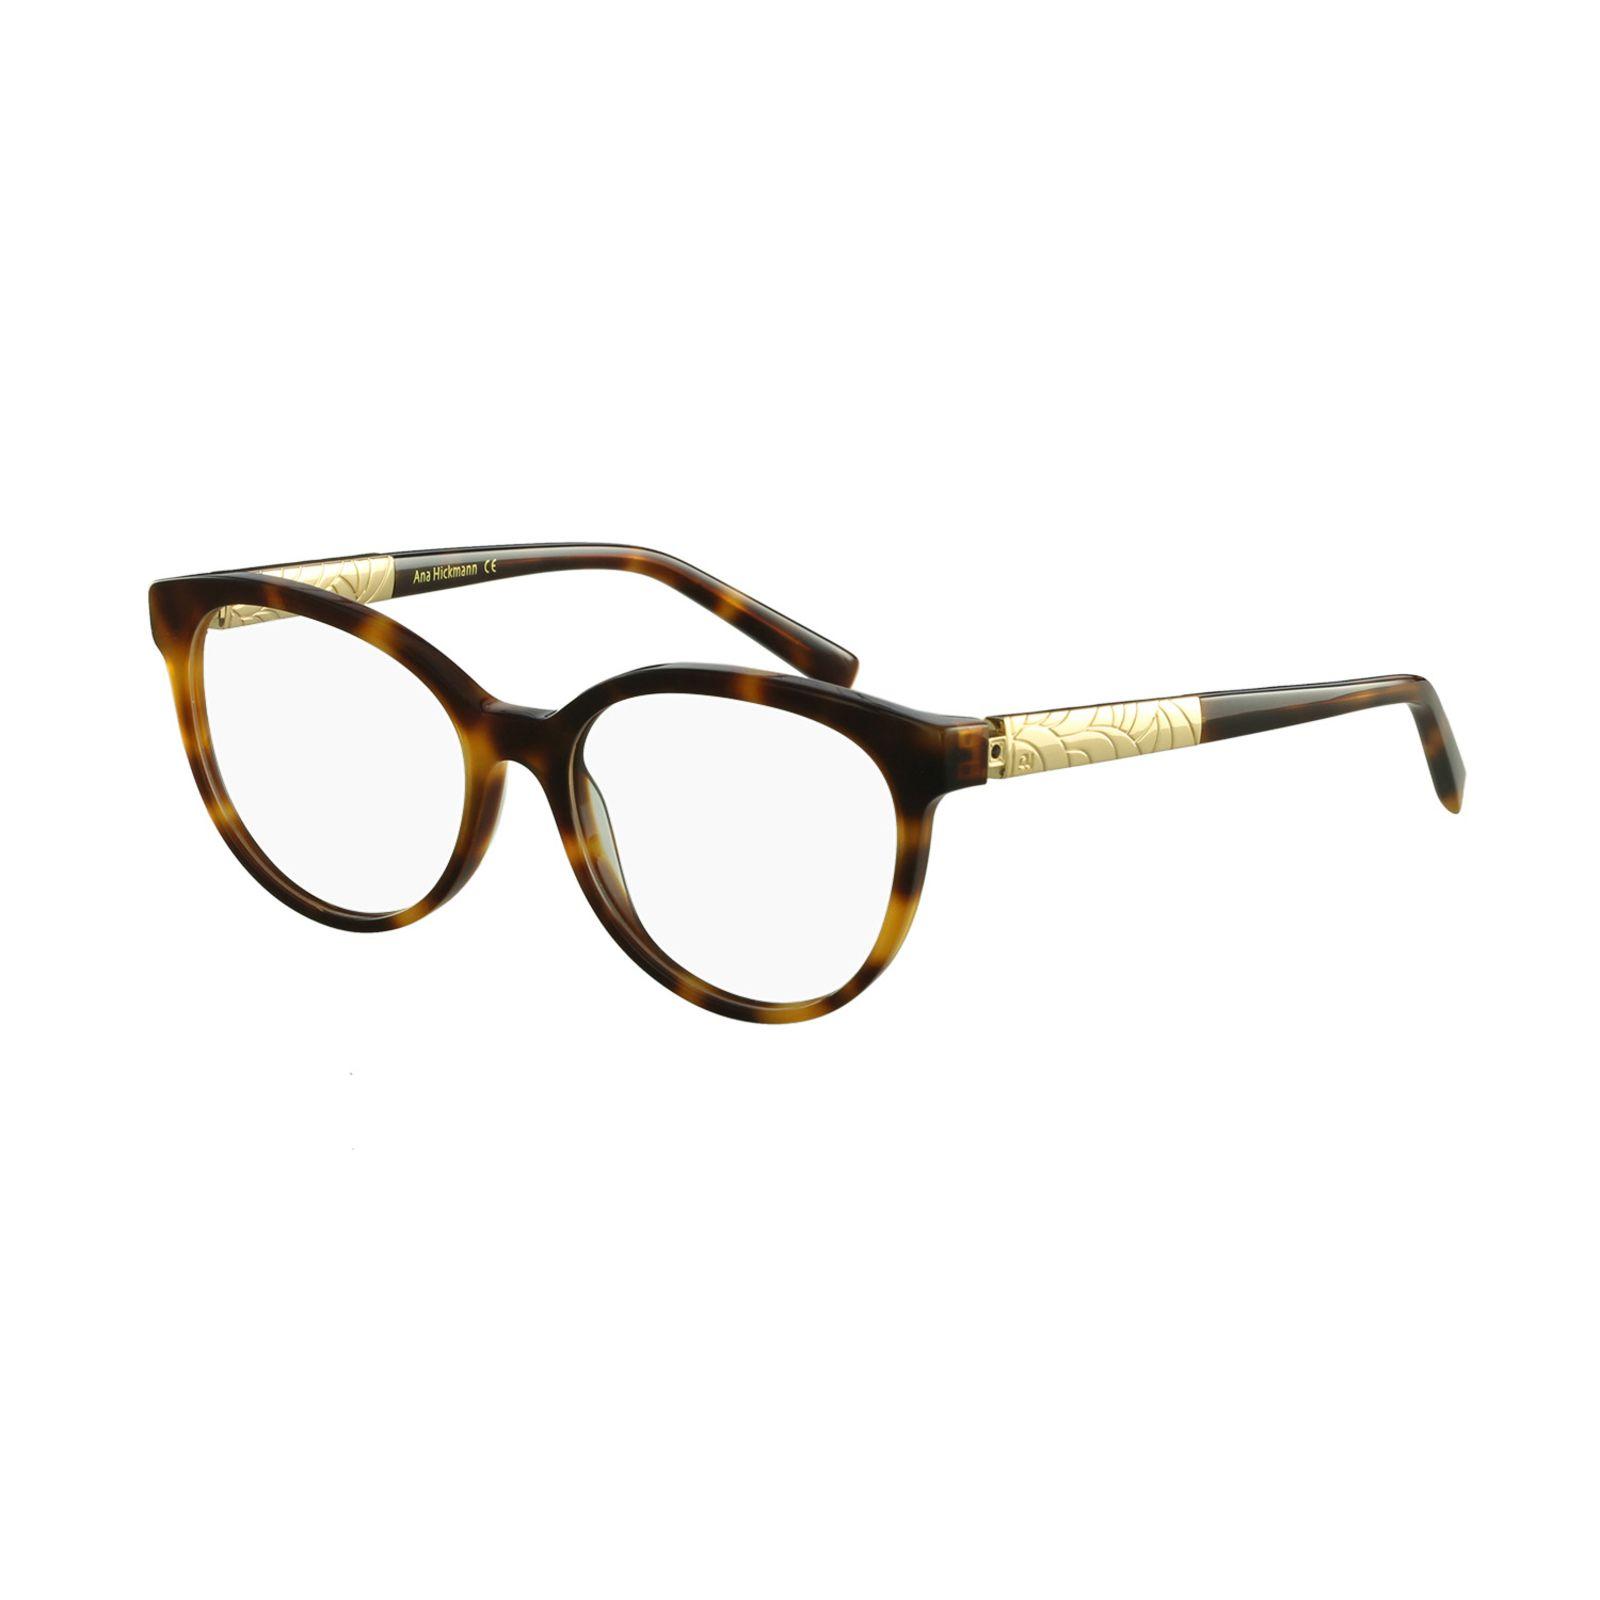 Armacao De Oculos Ana Hickmann Casual Marrom Armacoes De Oculos